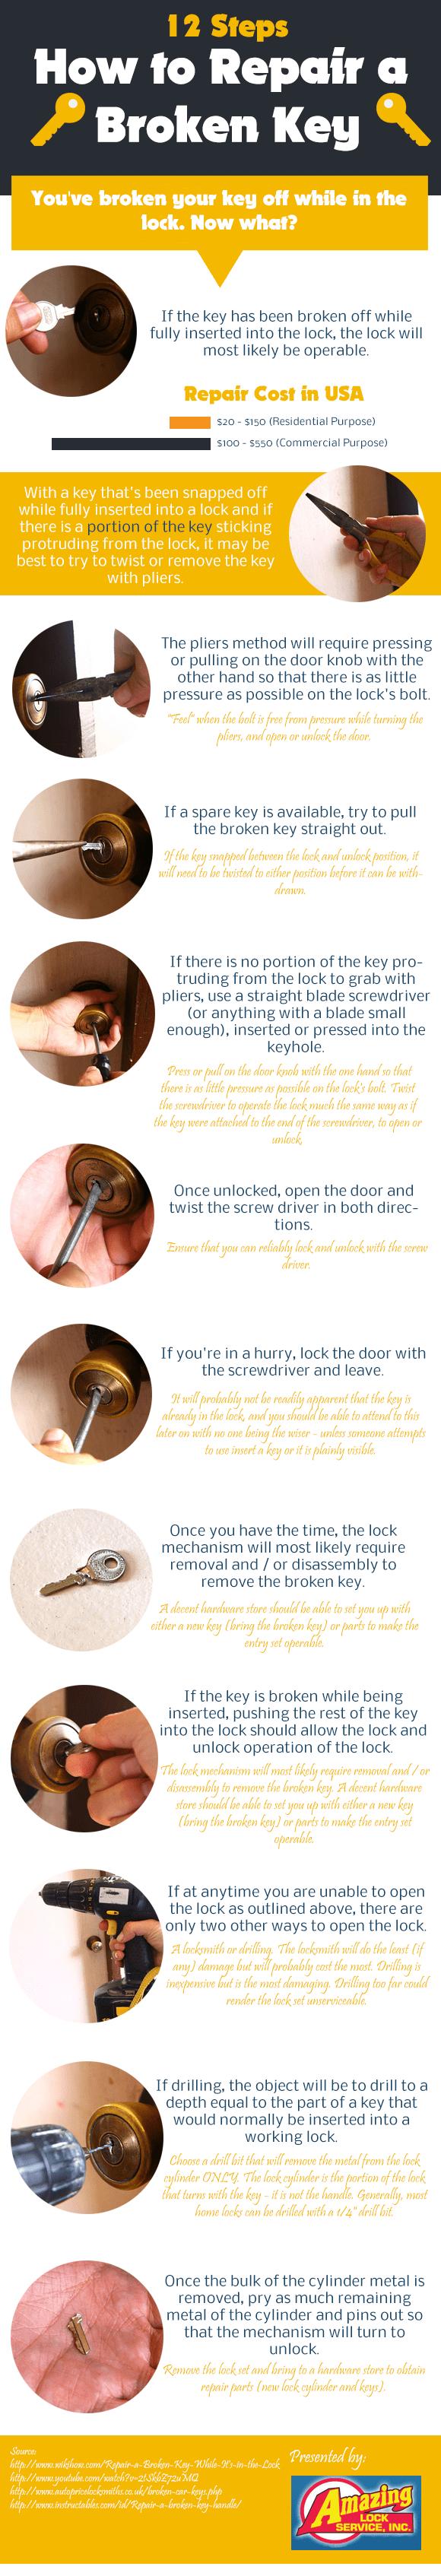 12-steps-how-to-repair-a-broken-key_525b9133ae123